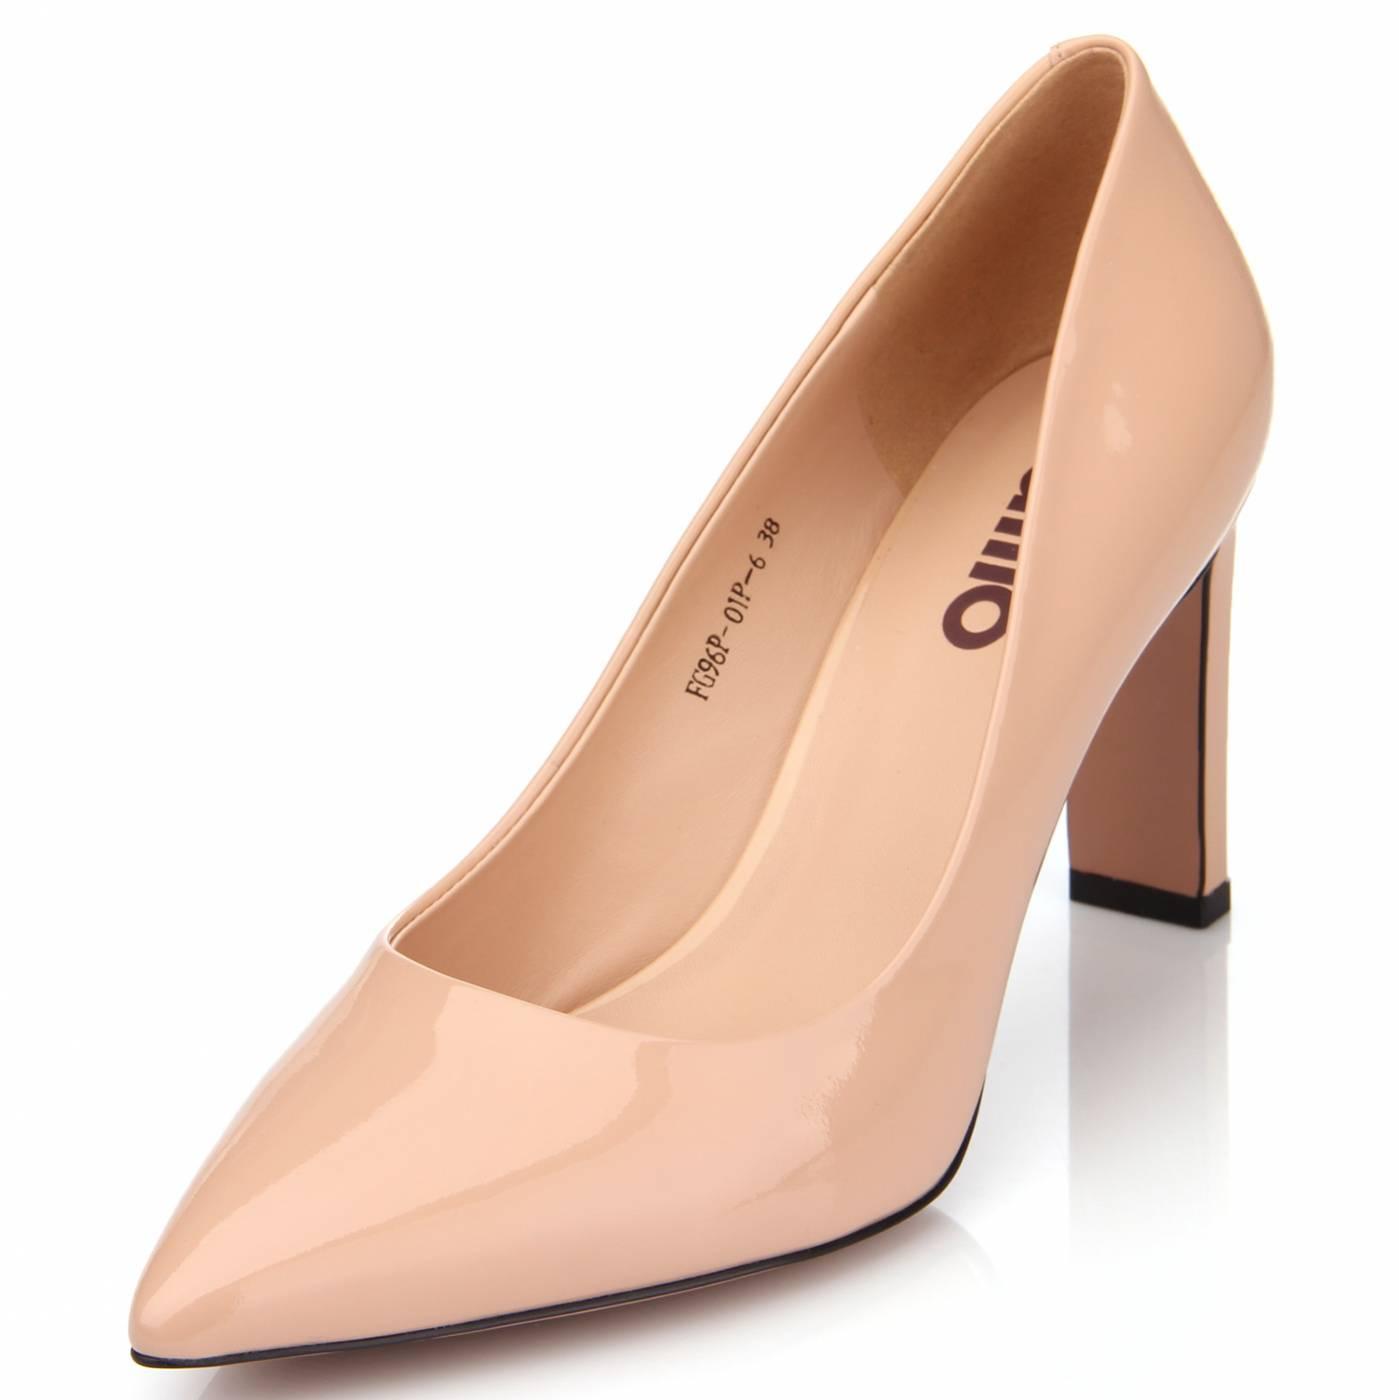 Туфлі жіночі ditto 6424 Бежевий купить по выгодной цене в интернет ... a58601bad8dc7